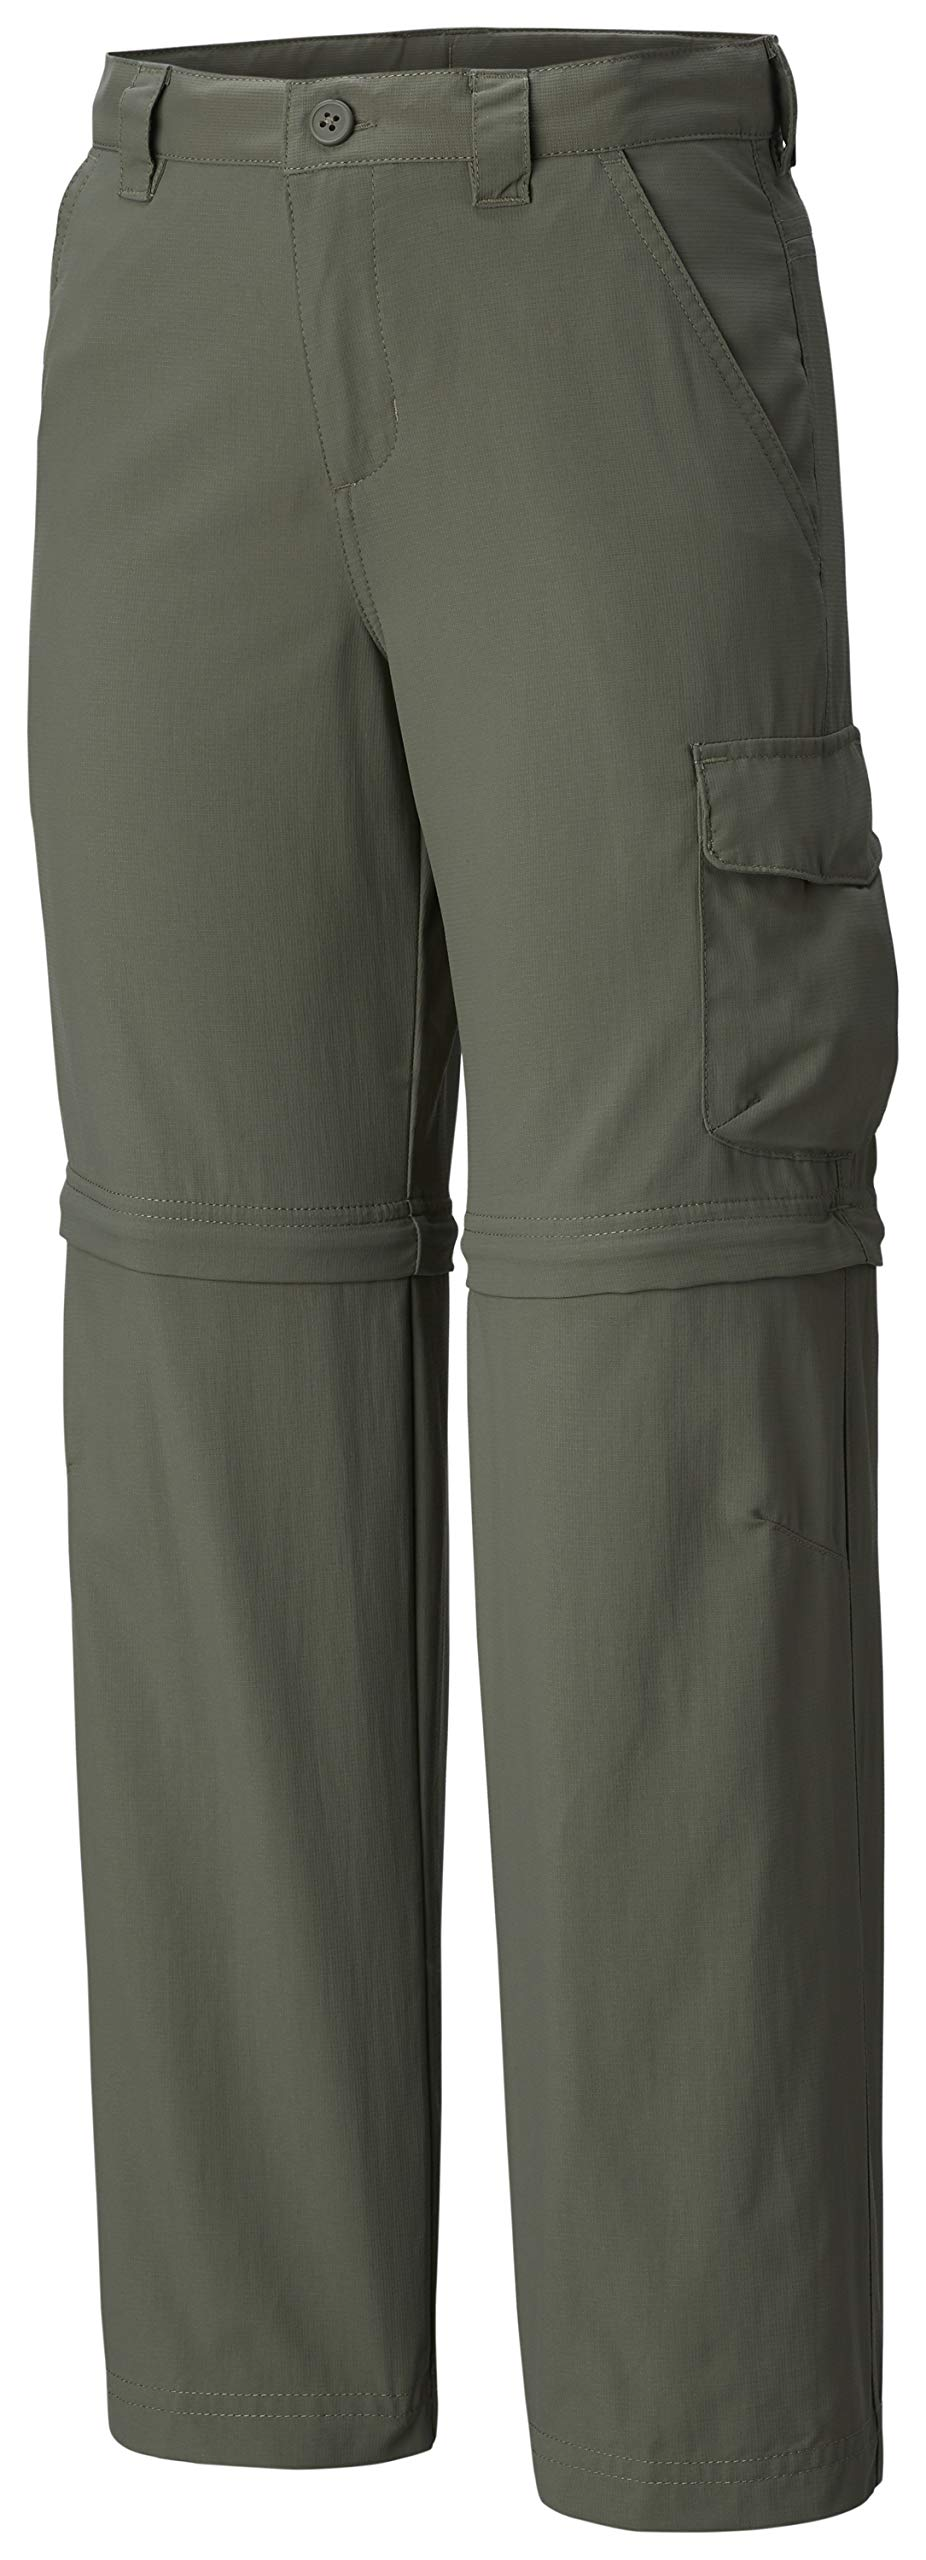 Columbia Youth Boys Silver Ridge III Convertible Pants, Cypress, Medium by Columbia